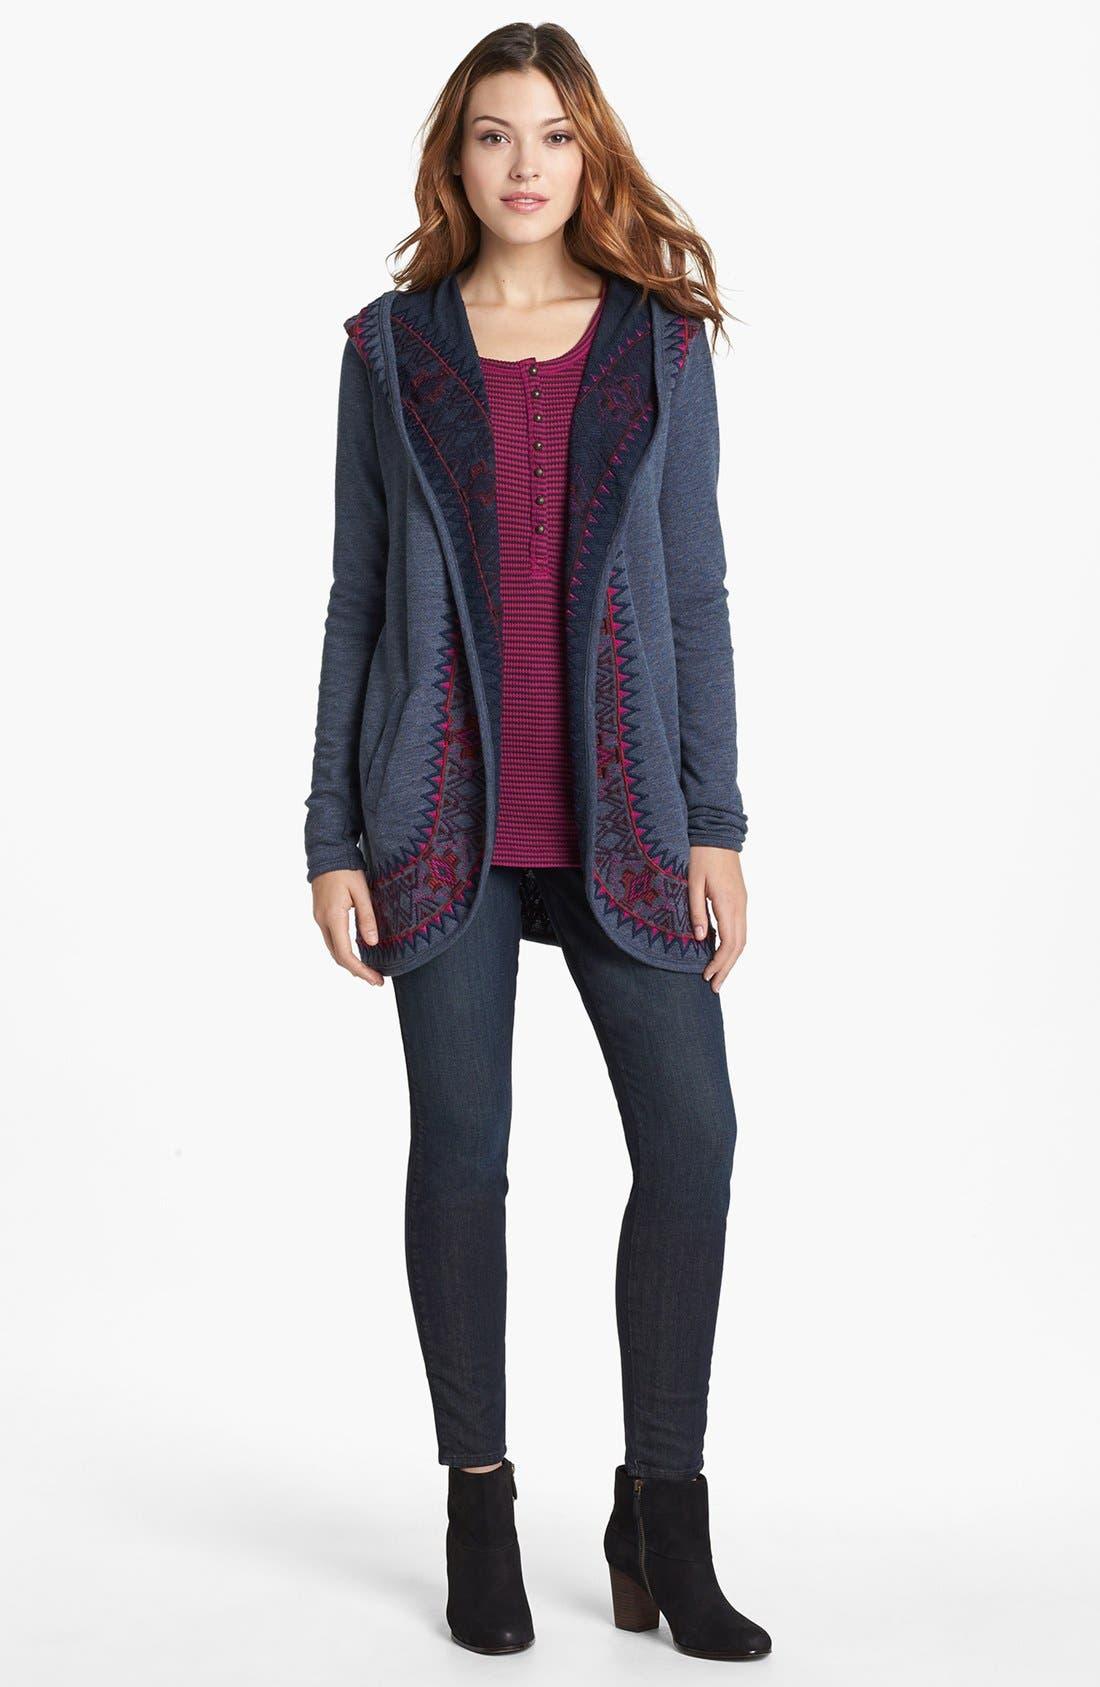 Main Image - Lucky Brand 'Sofia' Tuxedo Piped Skinny Jeans (Cullowhee)